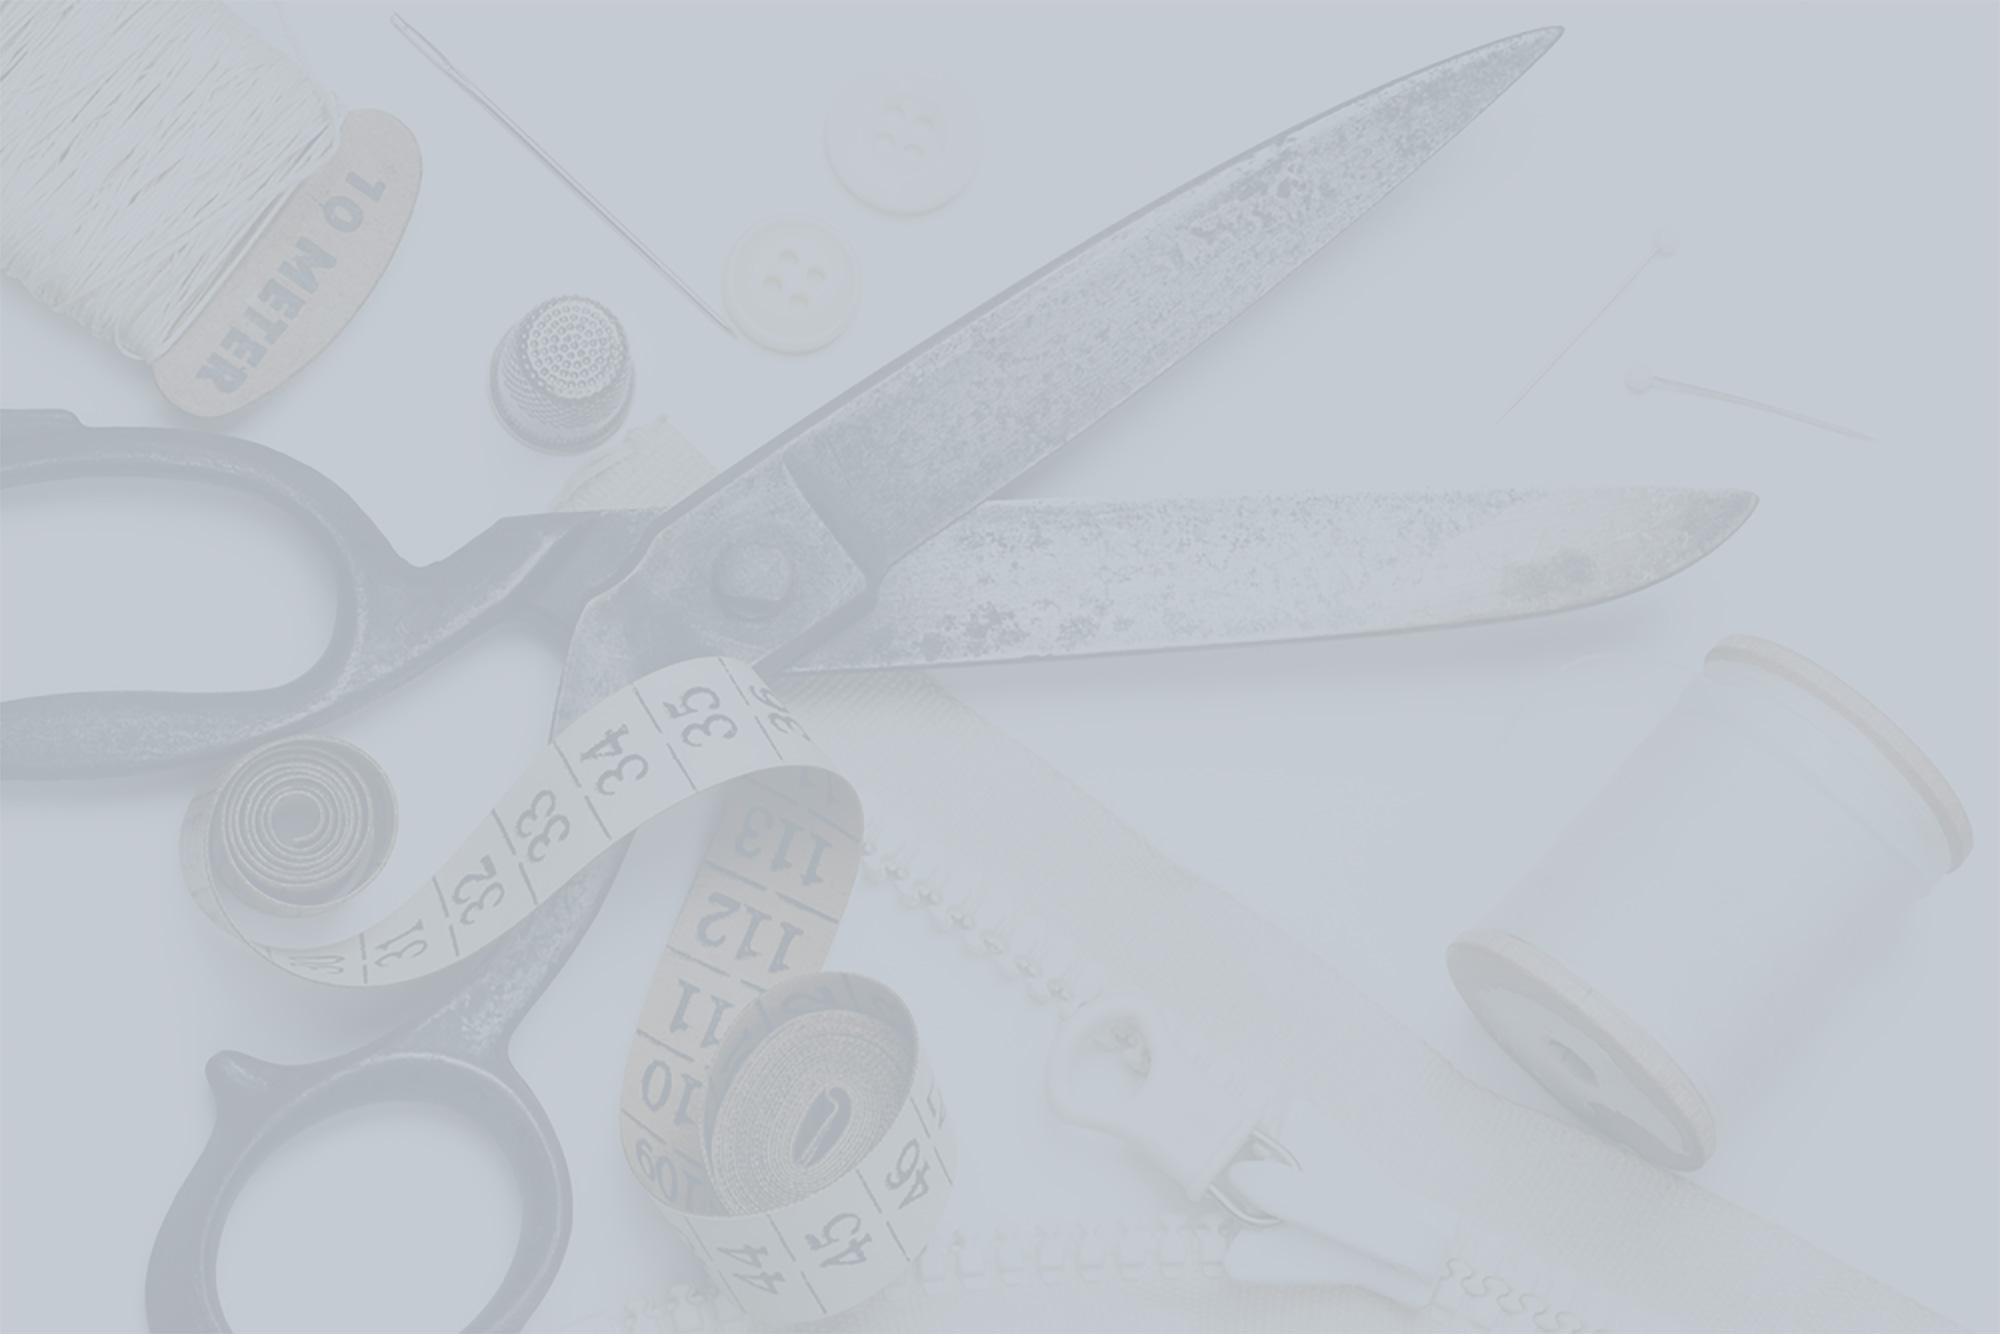 shutterstock_52400254-tailoring2